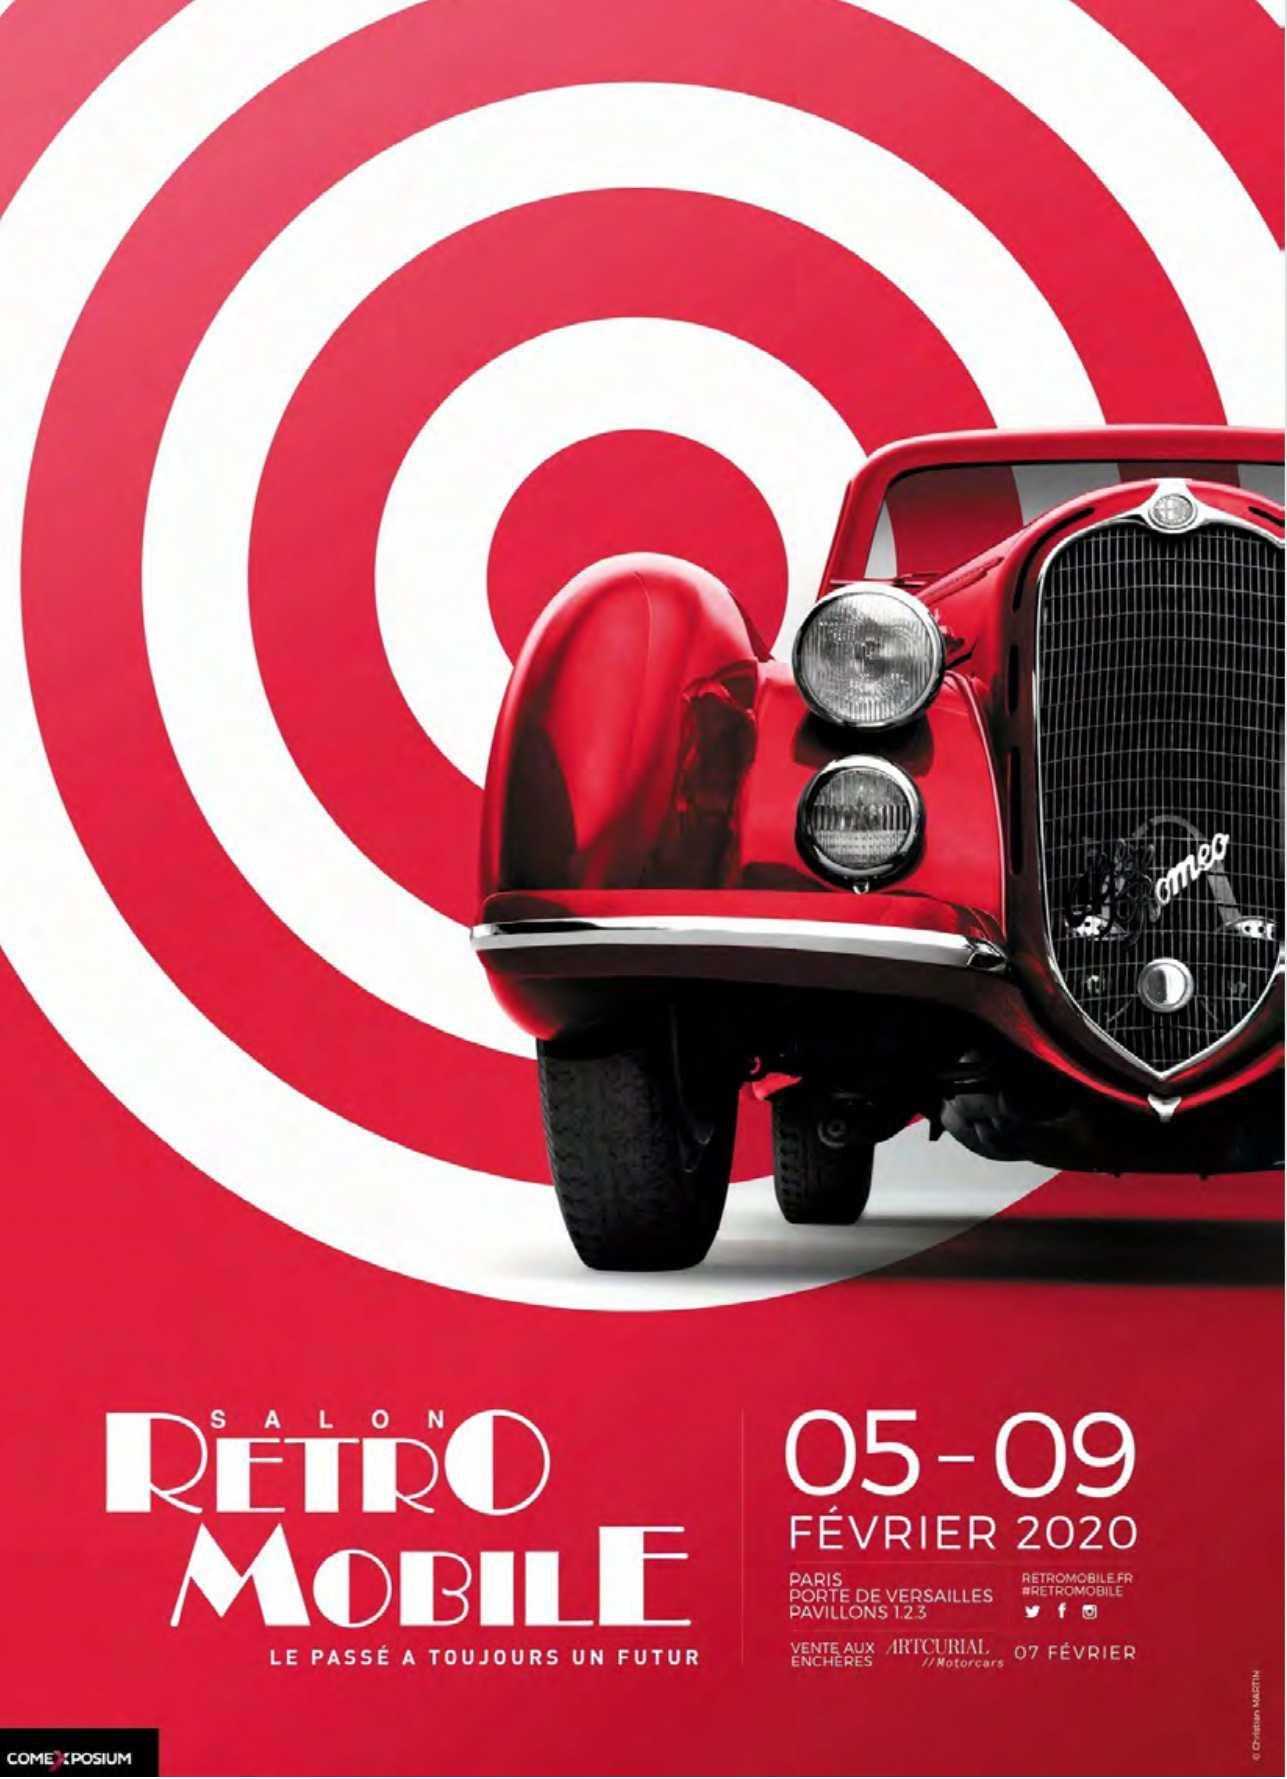 Ferias en París 2020 RetroMobile